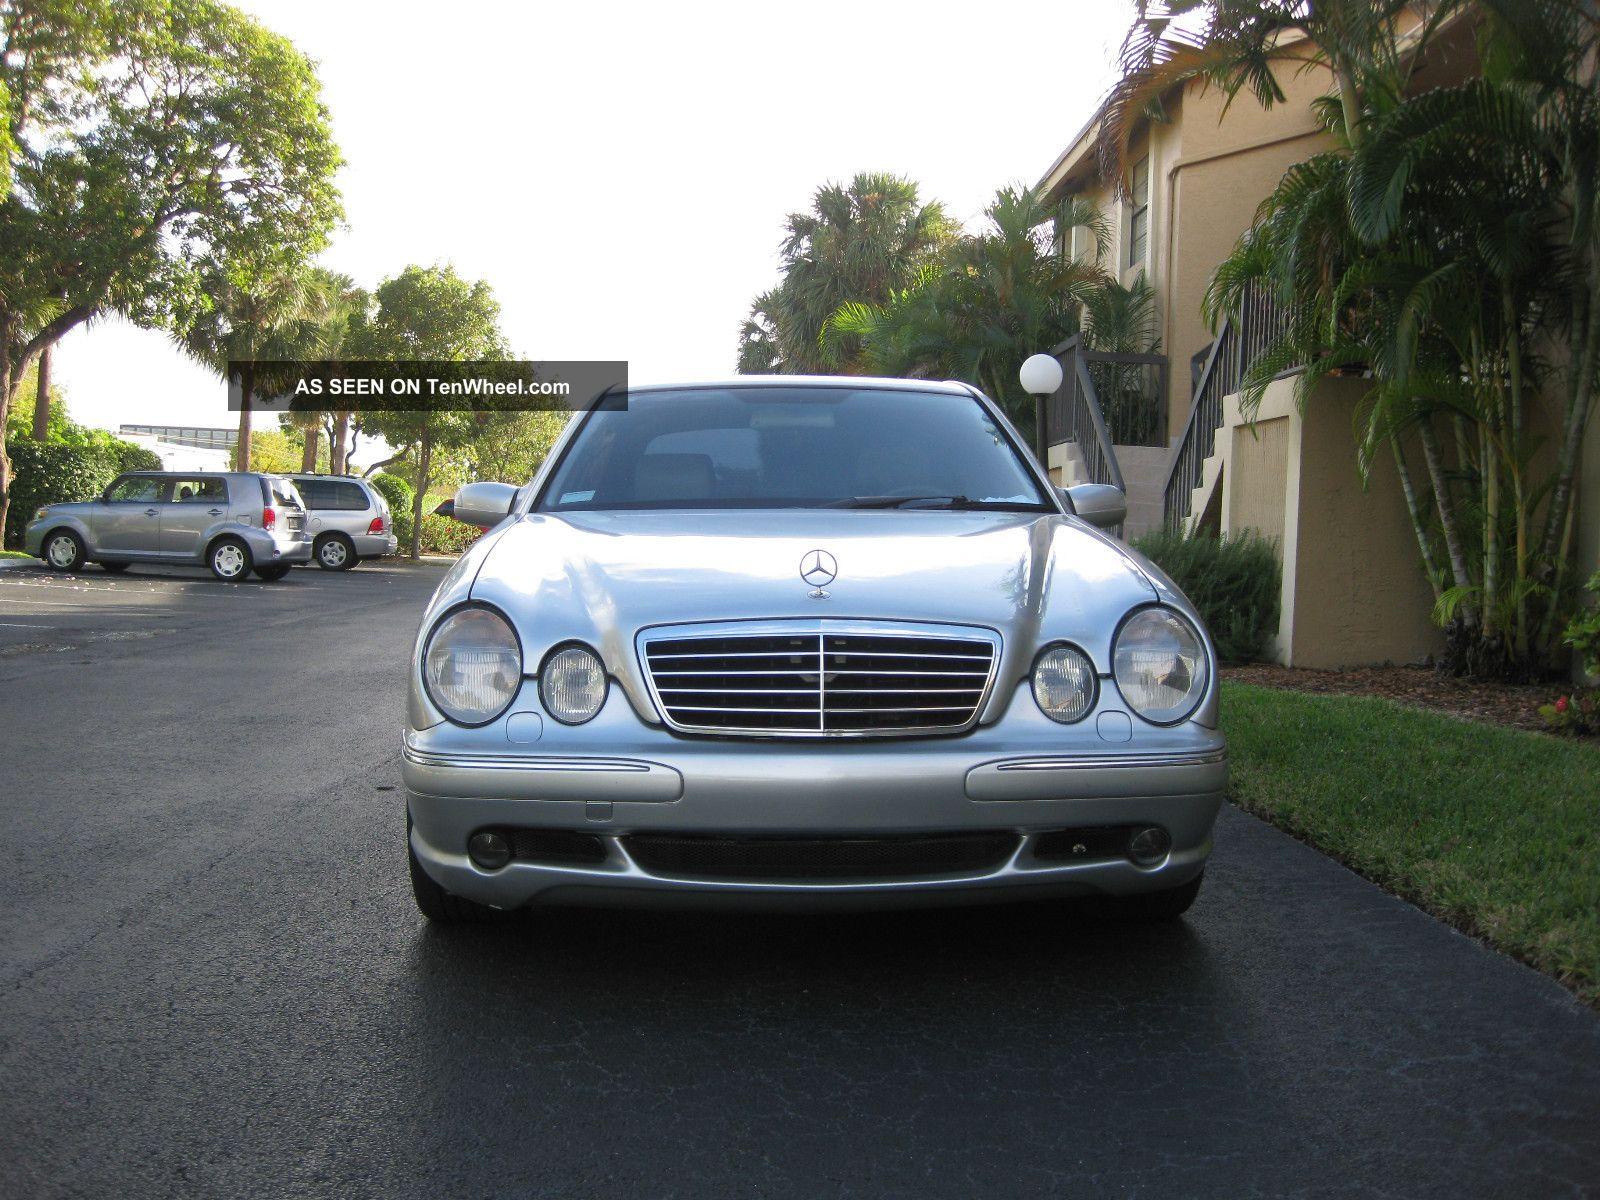 2001 mercedes benz e55 amg base sedan 4 door 5 5l for Mercedes benz e55 amg